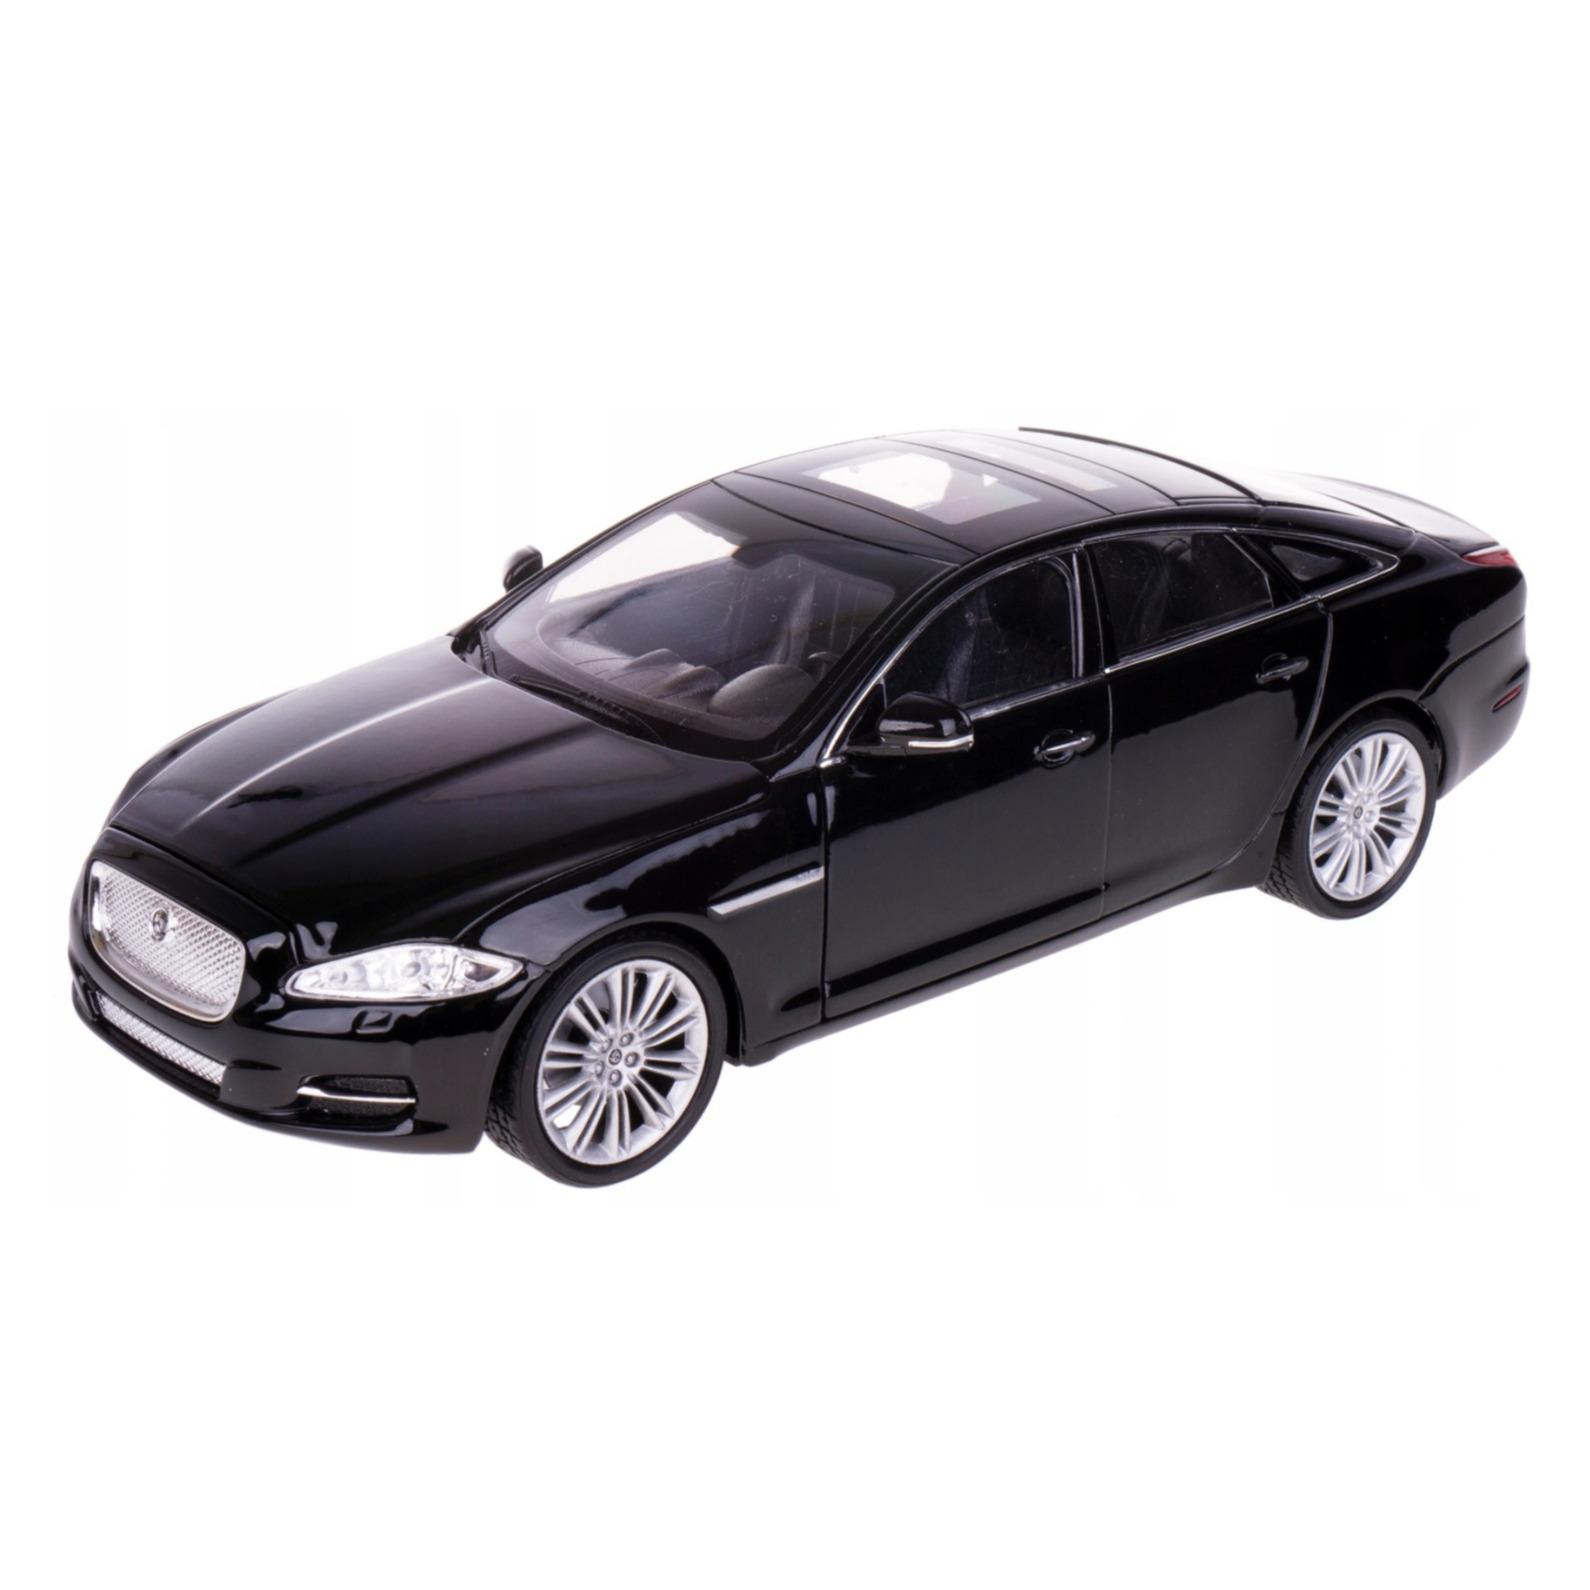 Speelgoedauto jaguar xj zwart 1 24 21 x 8 x 6 cm